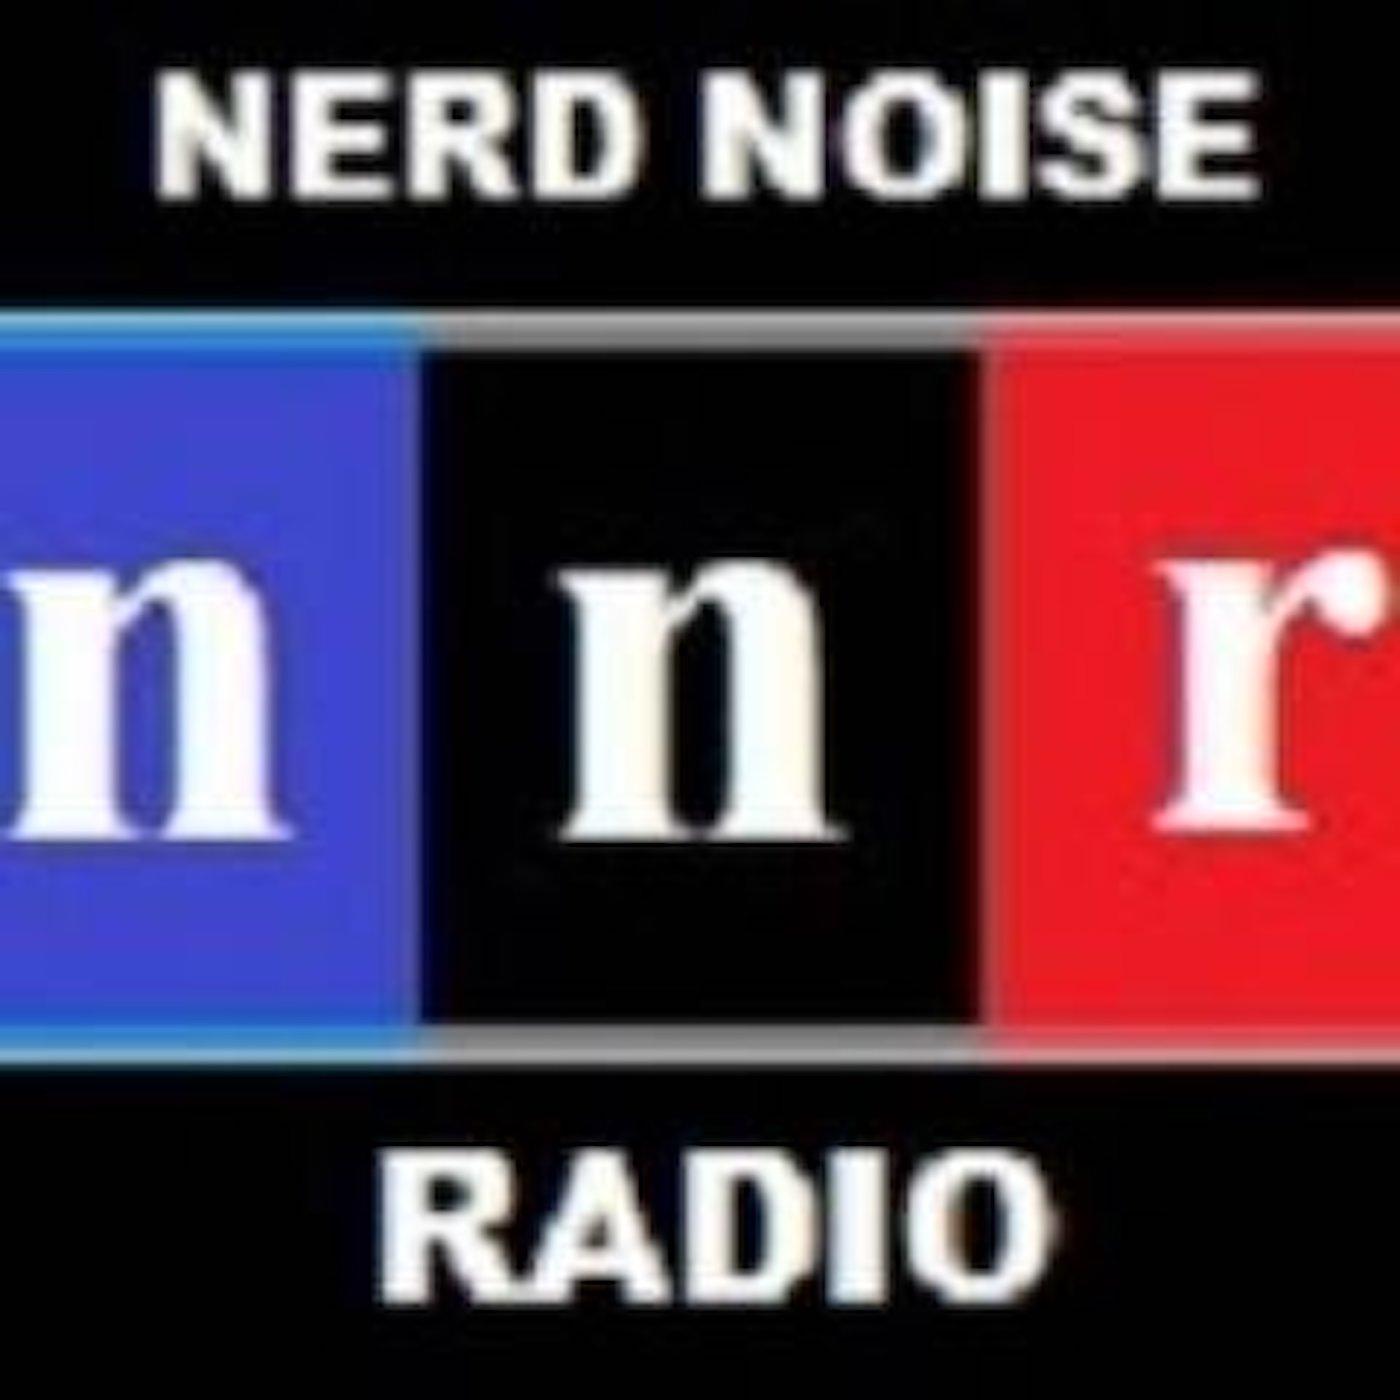 Nerd Noise Radio Network - All Channels (Hi-Fi)